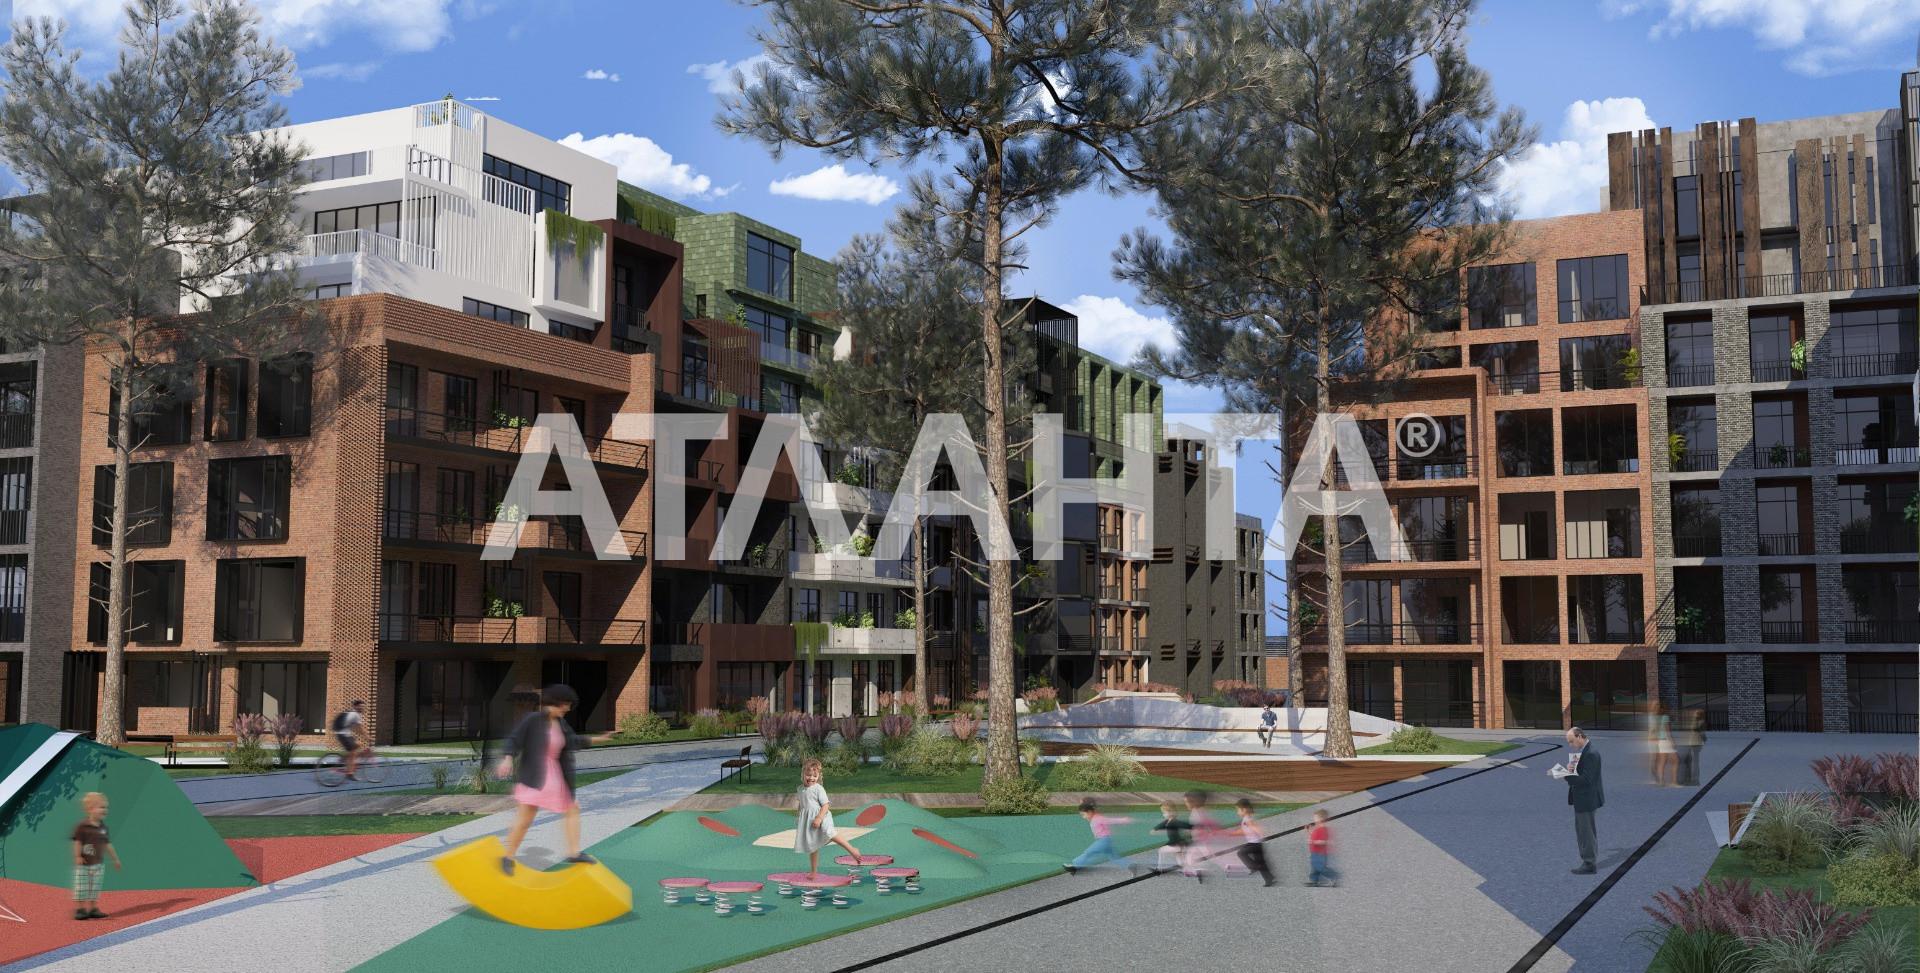 Продается 1-комнатная Квартира на ул. Донского Дмитрия — 39 710 у.е. (фото №2)